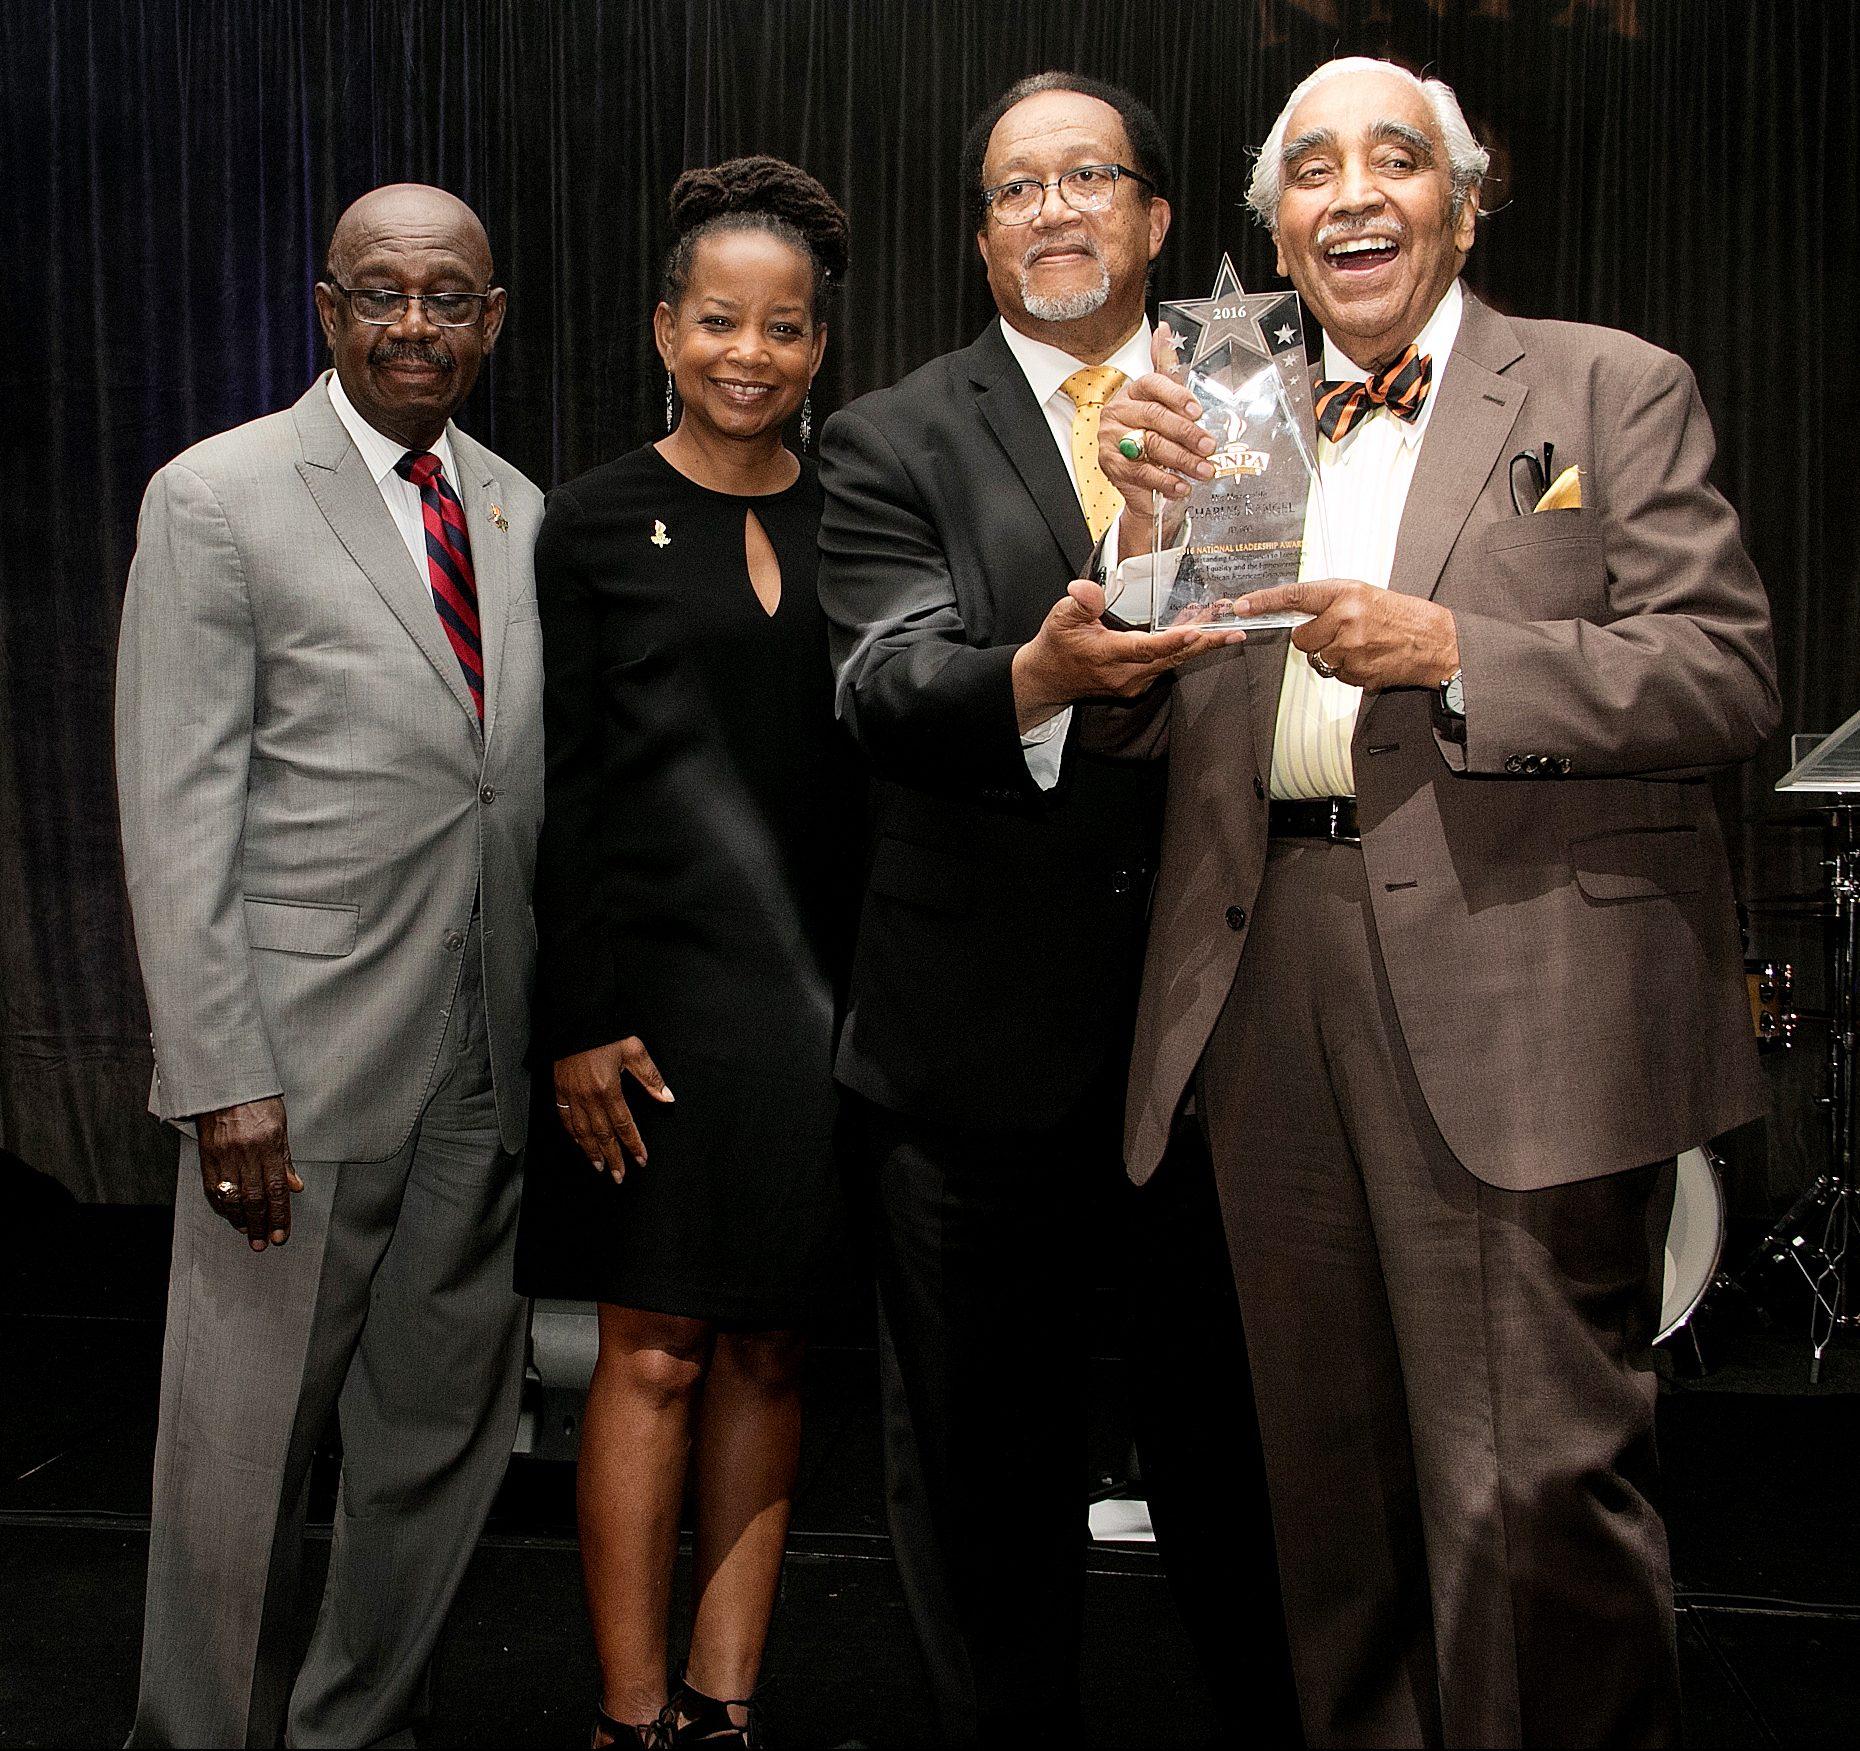 Denise Rolark Barnes, NNPA chair and Washington Informer publisher, along with Benjamin Chavis, NNPA president and CEO, present a trailblazer award to Rep. Charles Rangel (D-NY), right. / Photo by Shevry Lassiter